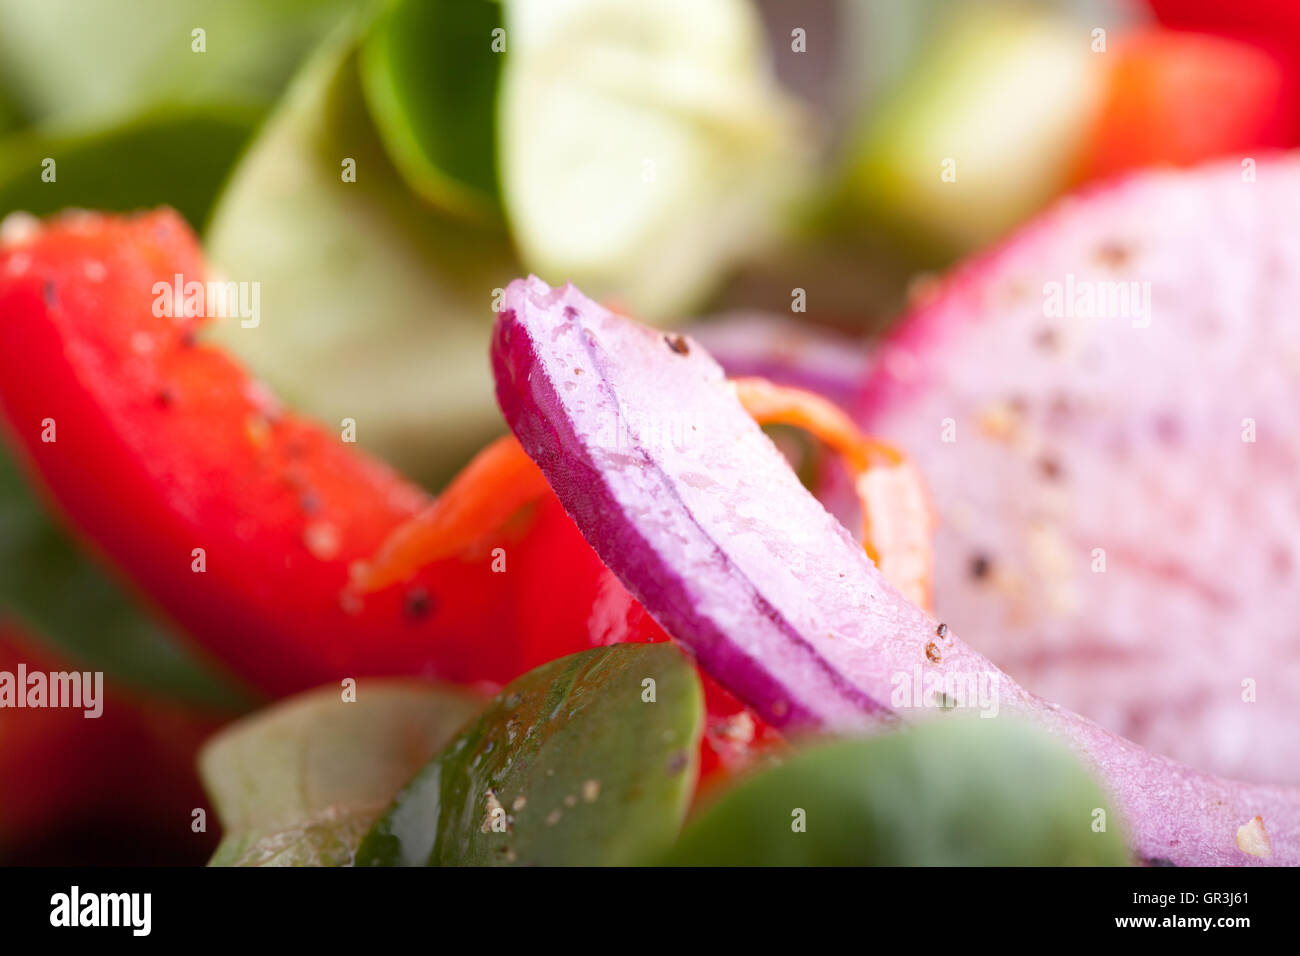 Salat Zutaten Stockbild